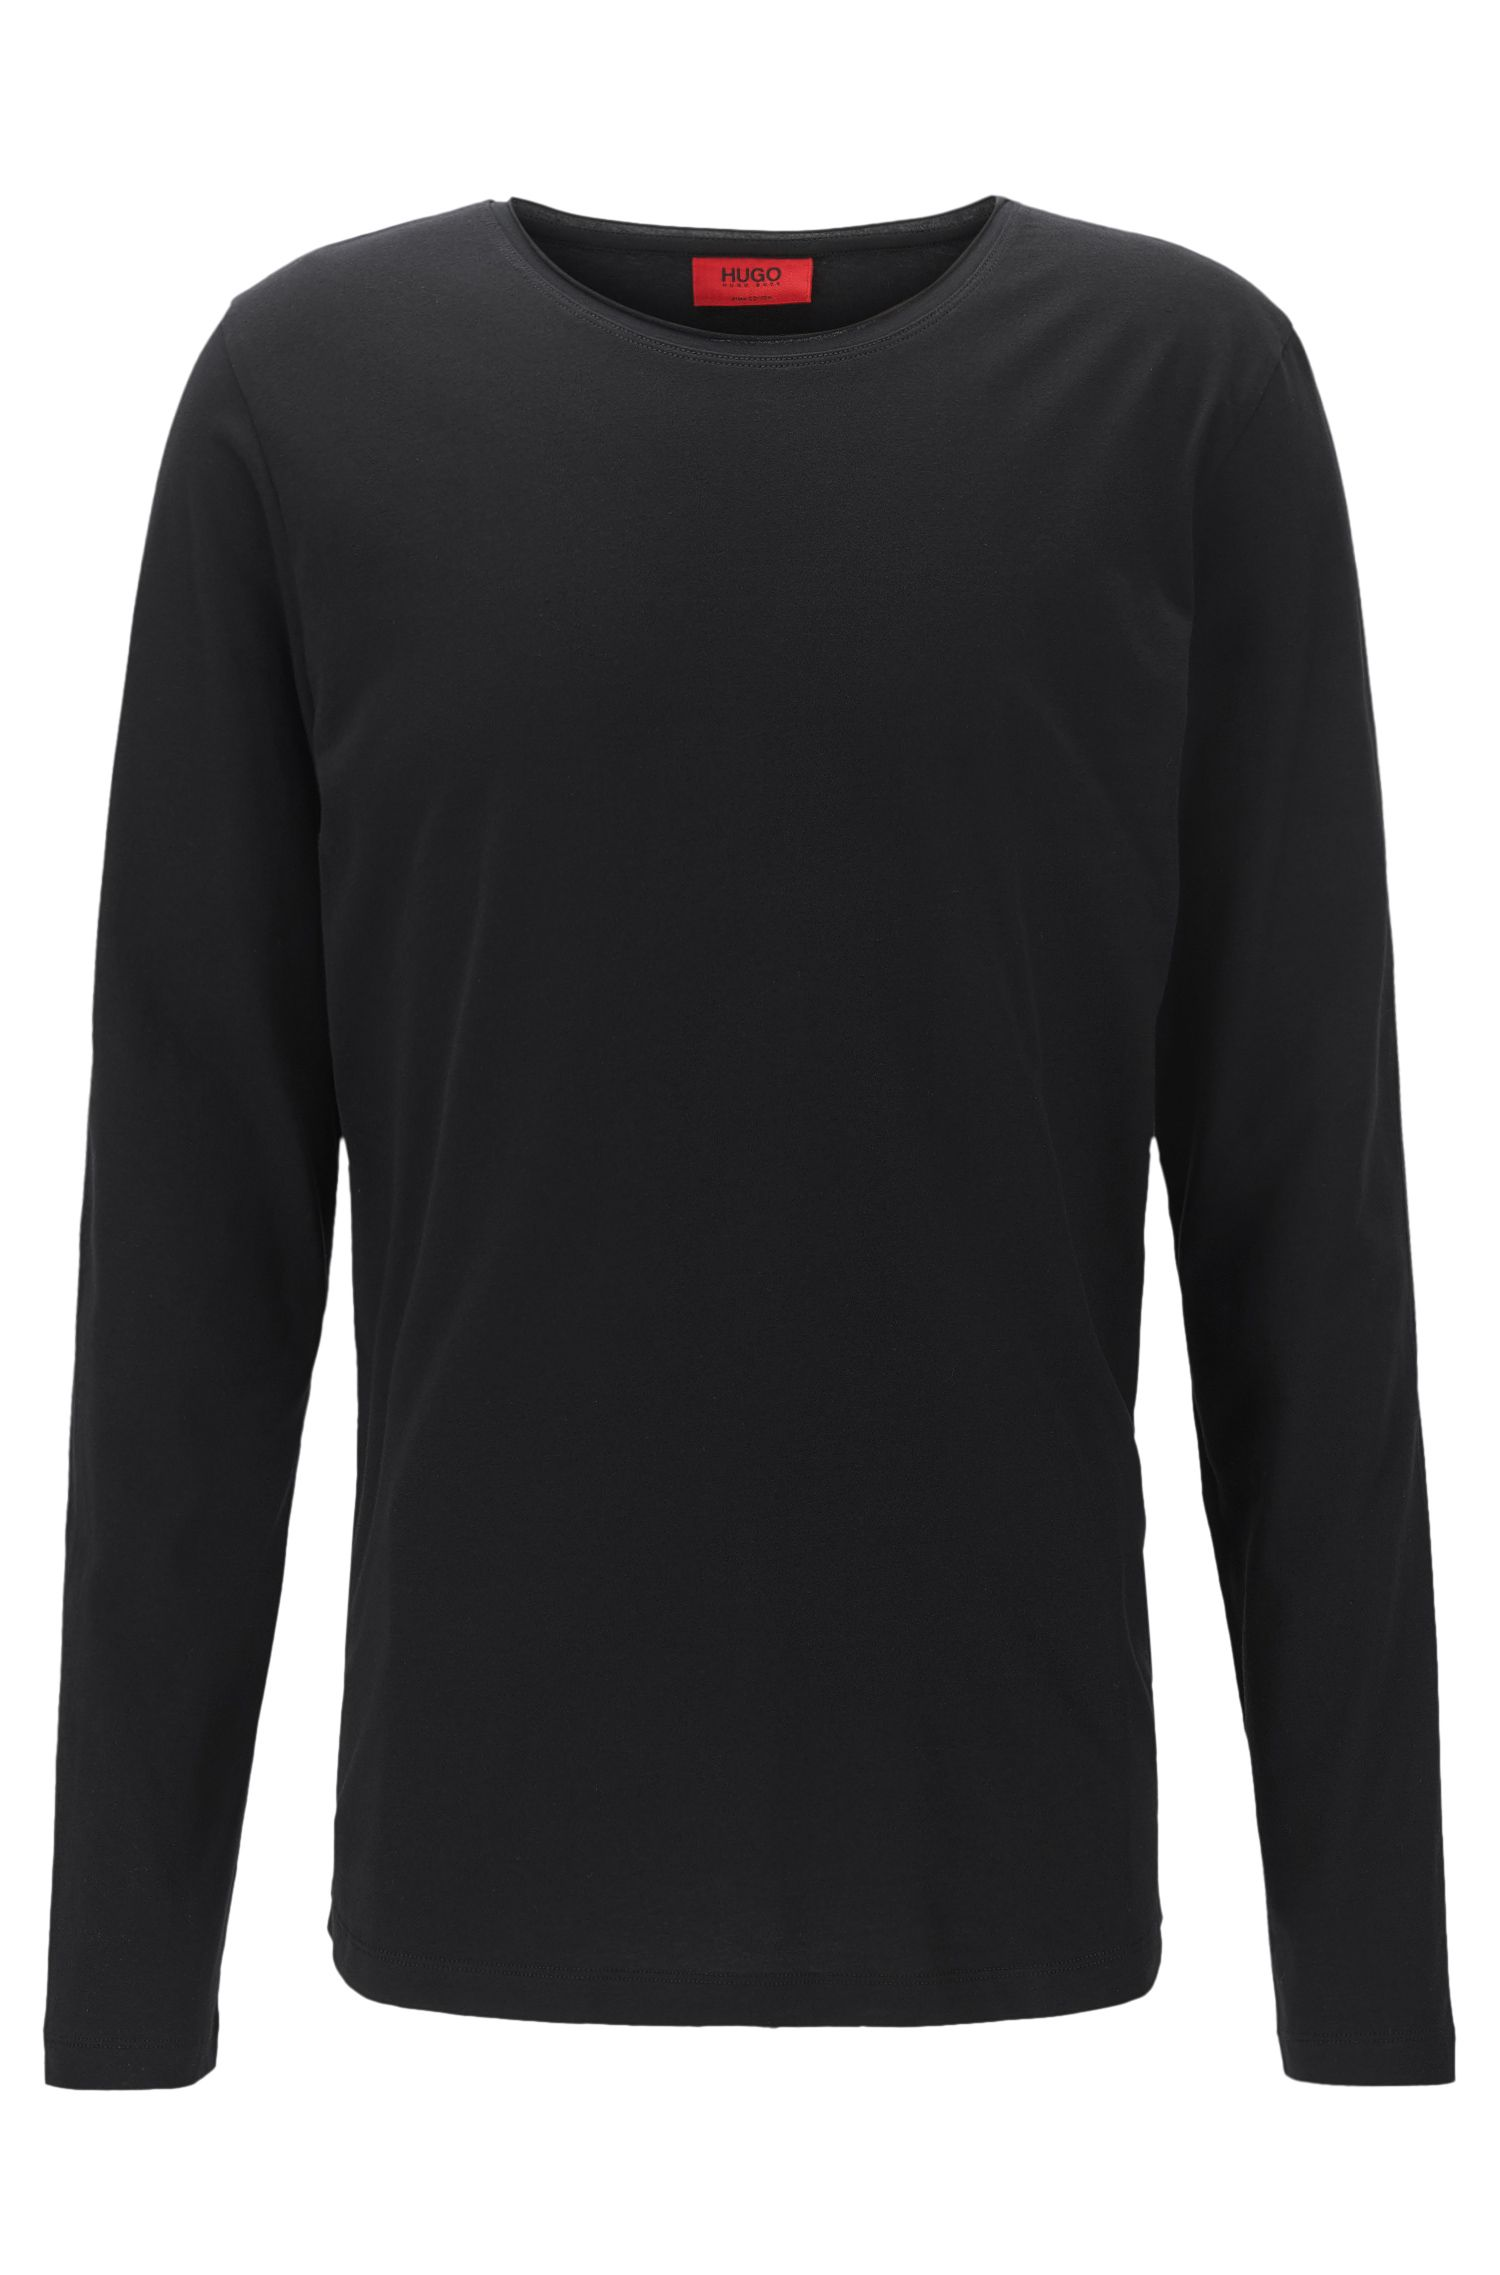 'Doopso' | Cotton Jersey T-Shirt